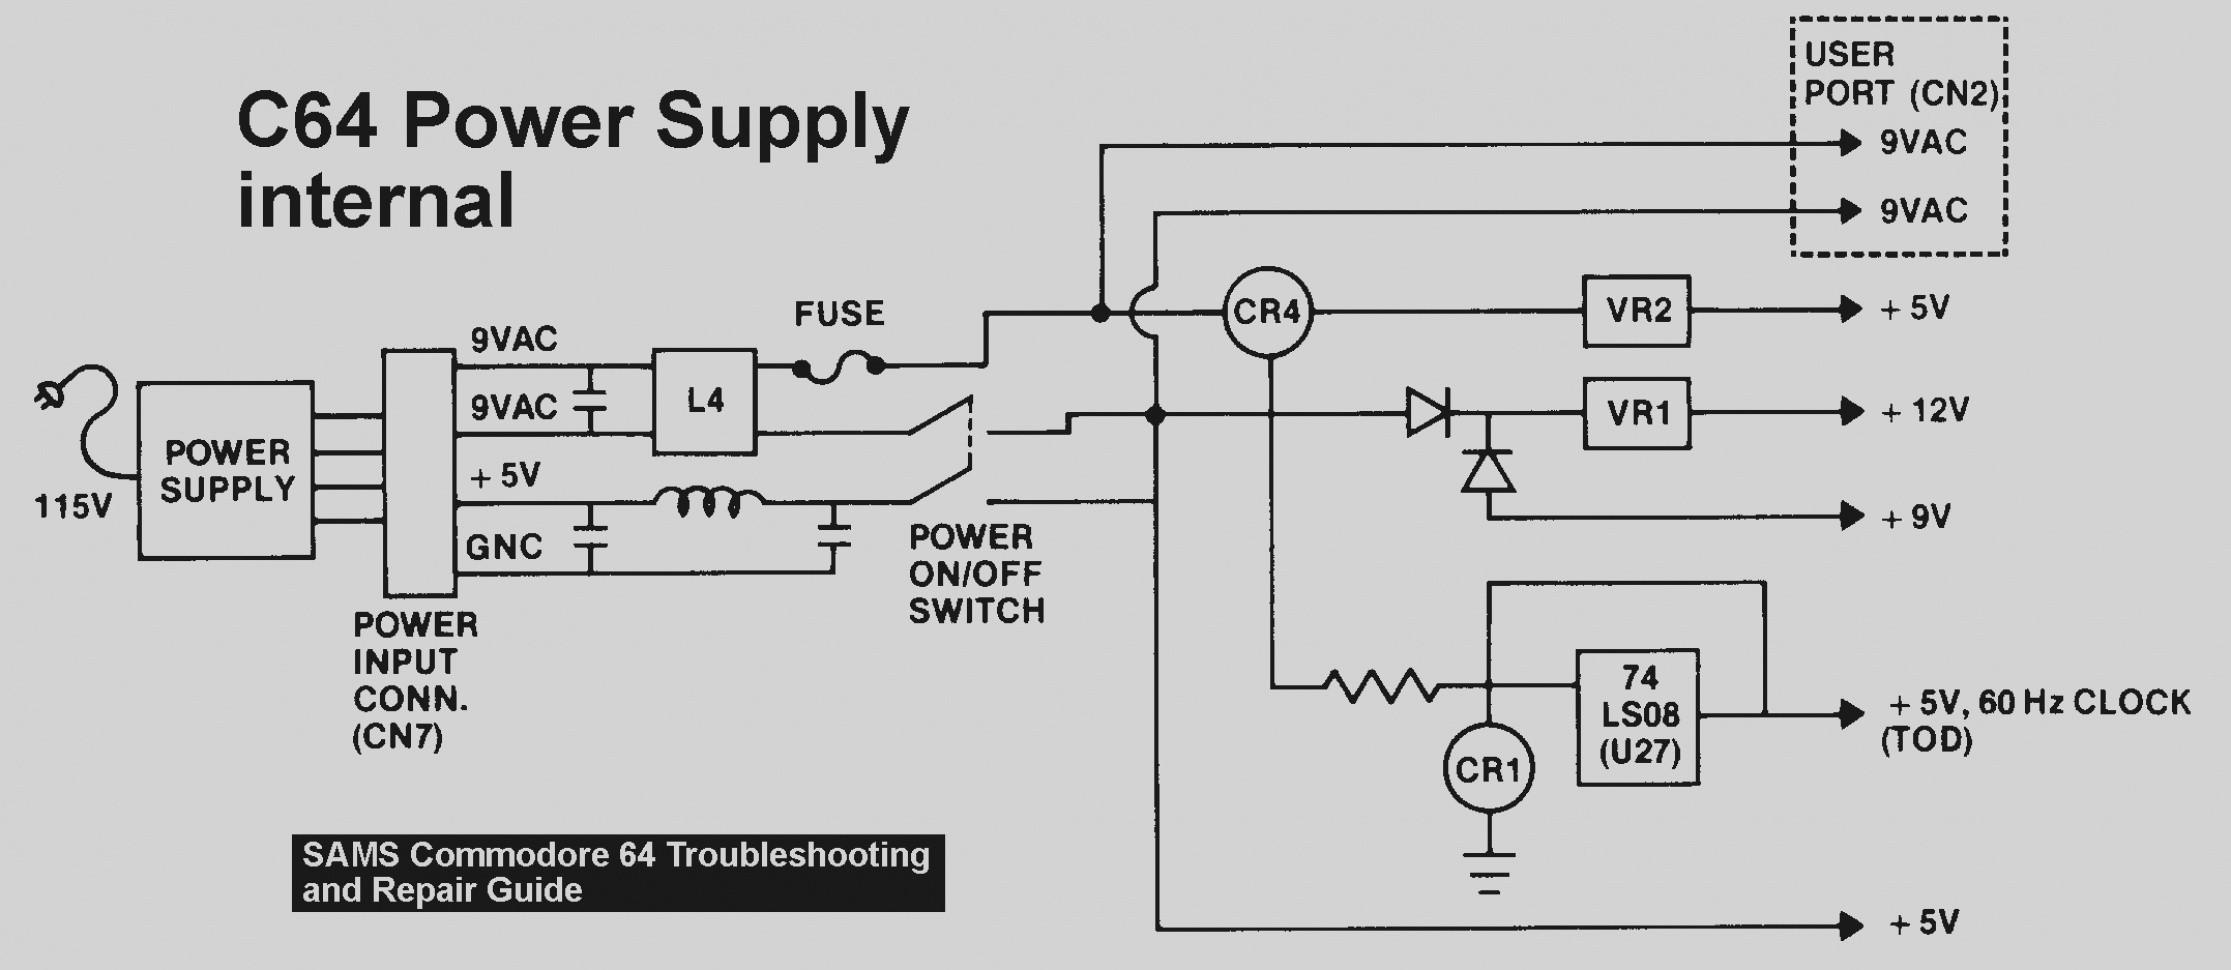 atx power supply schematic diagram on xbox 360 power supply diagrams wiring diagram furthermore atx power